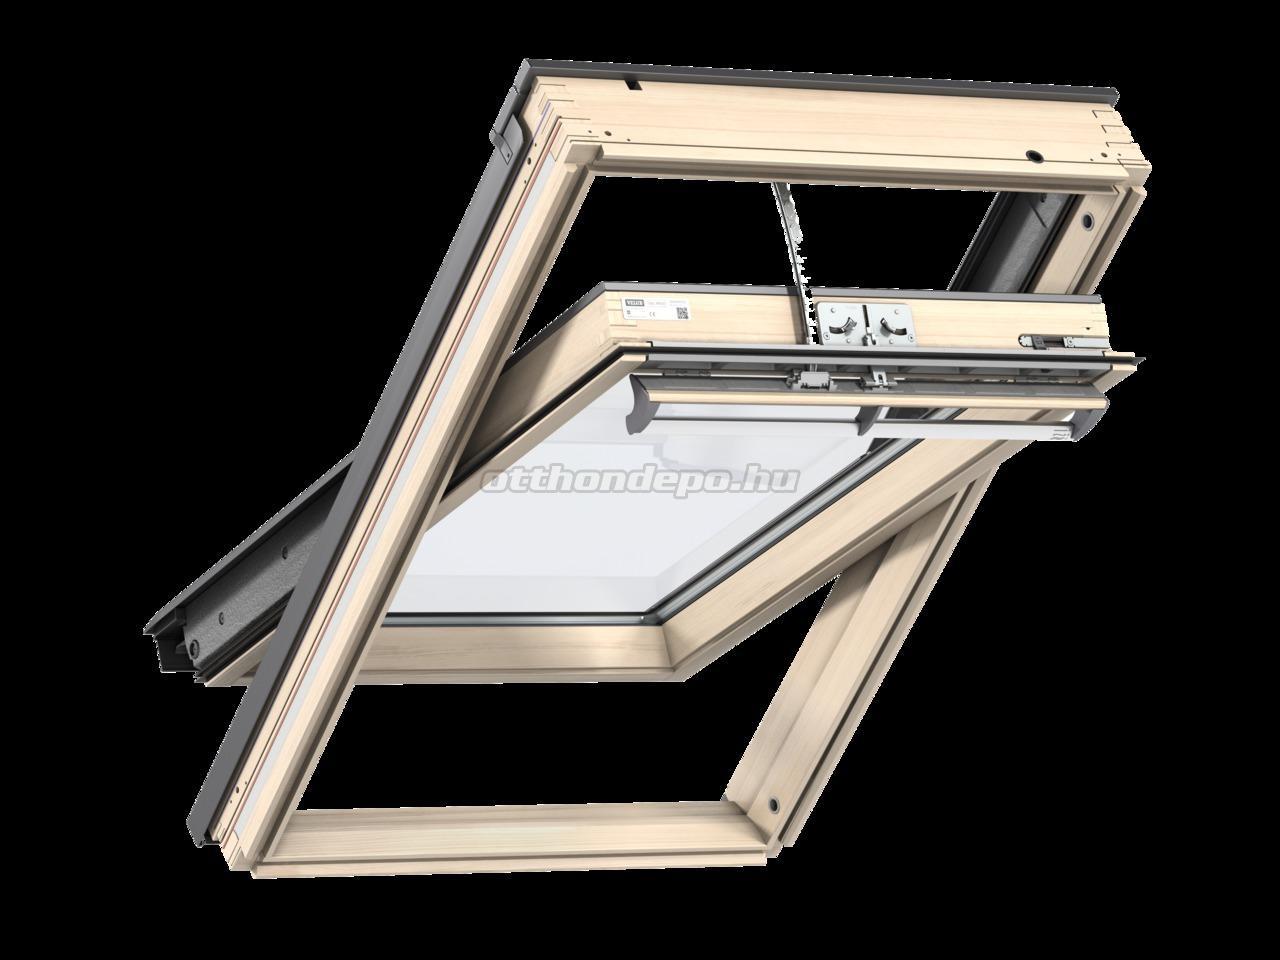 velux tet t ri ablak ggl mk04 306021 78x98 cm otthon depo web ruh z. Black Bedroom Furniture Sets. Home Design Ideas